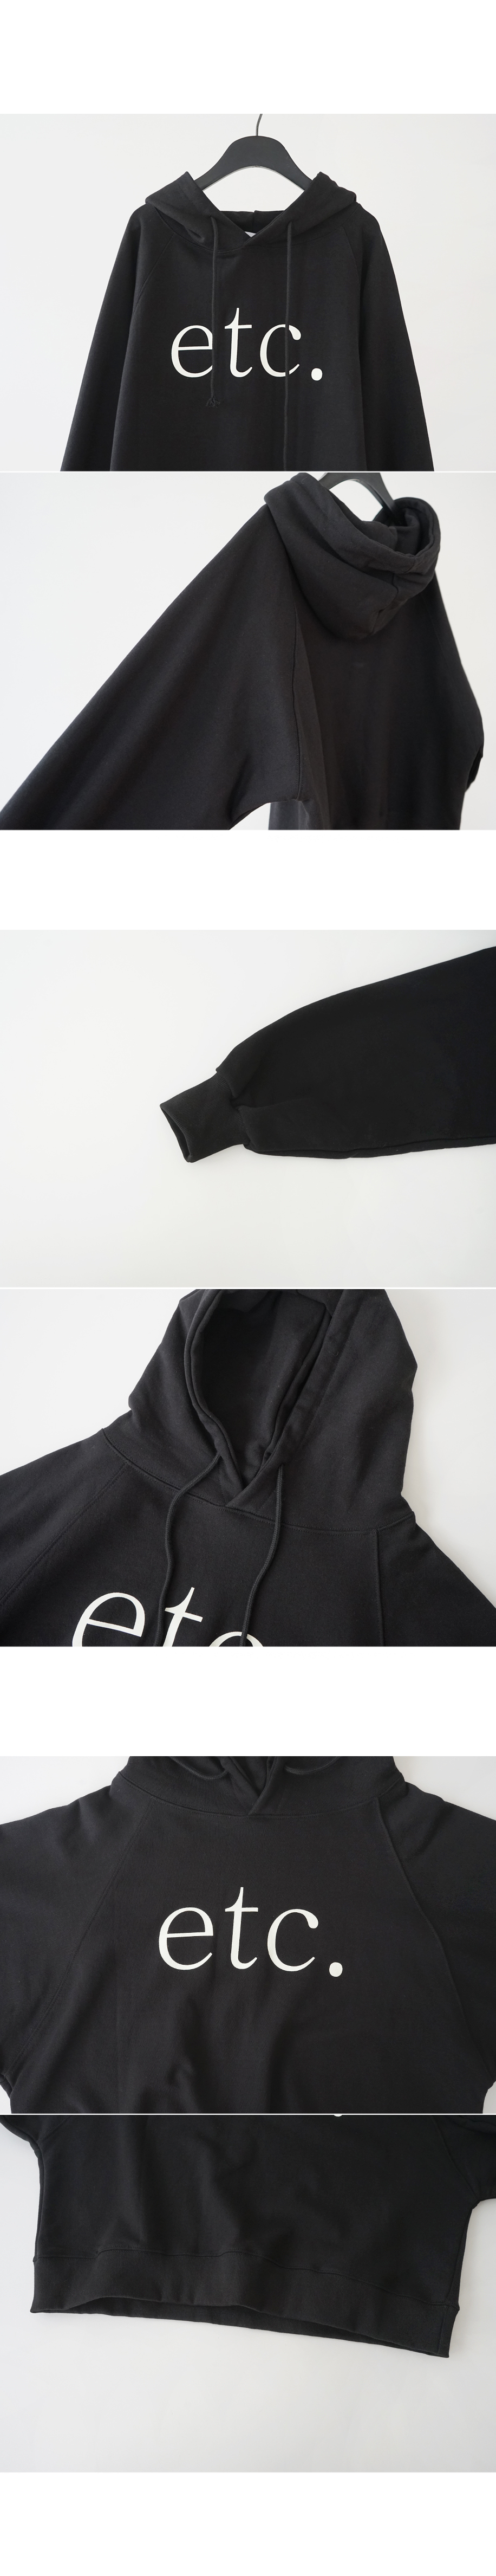 etc lettering hood (3colors)